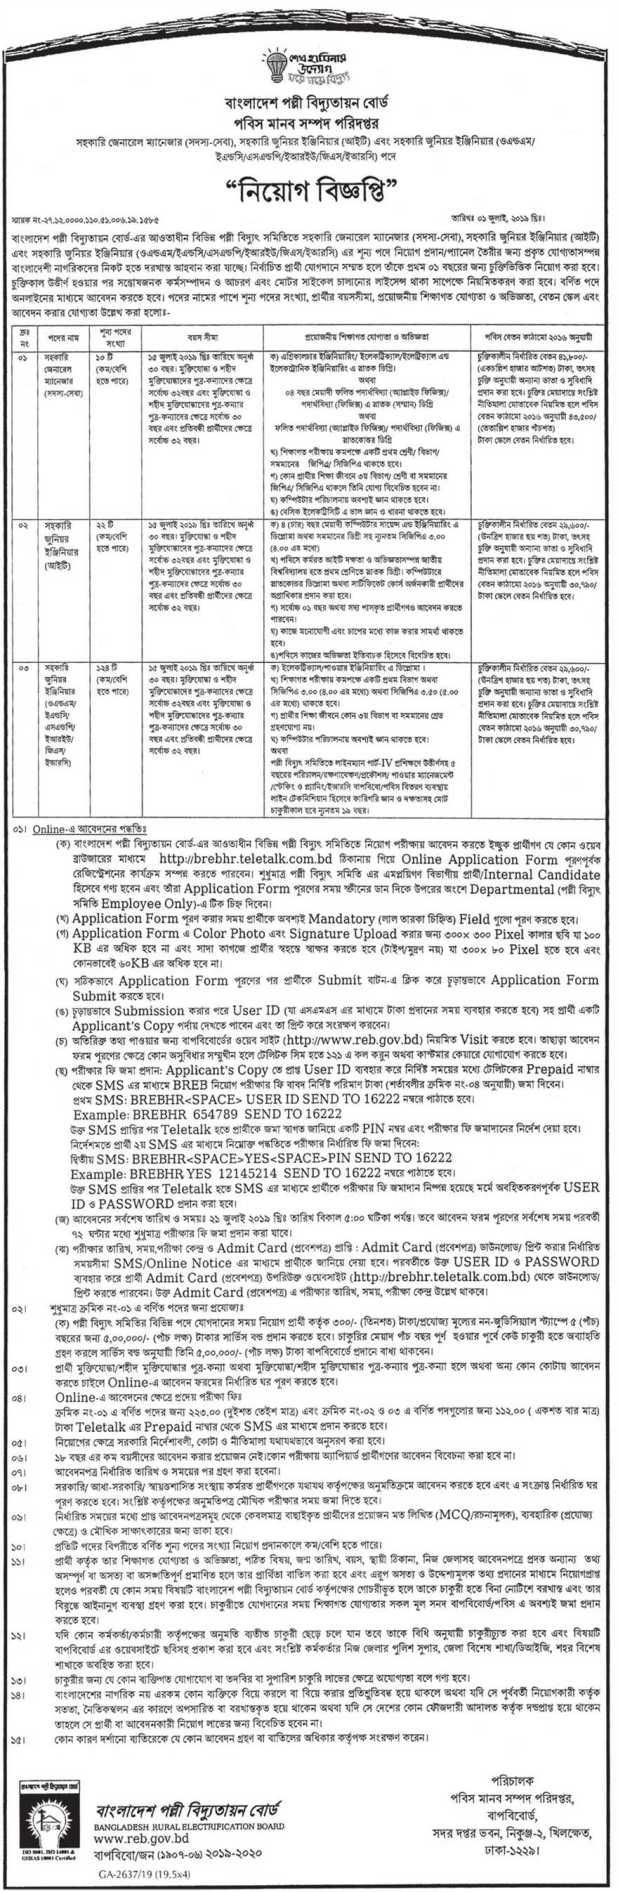 BD Jobs Rural Electrification Board BREB Job Circular 2019 All News Online BD